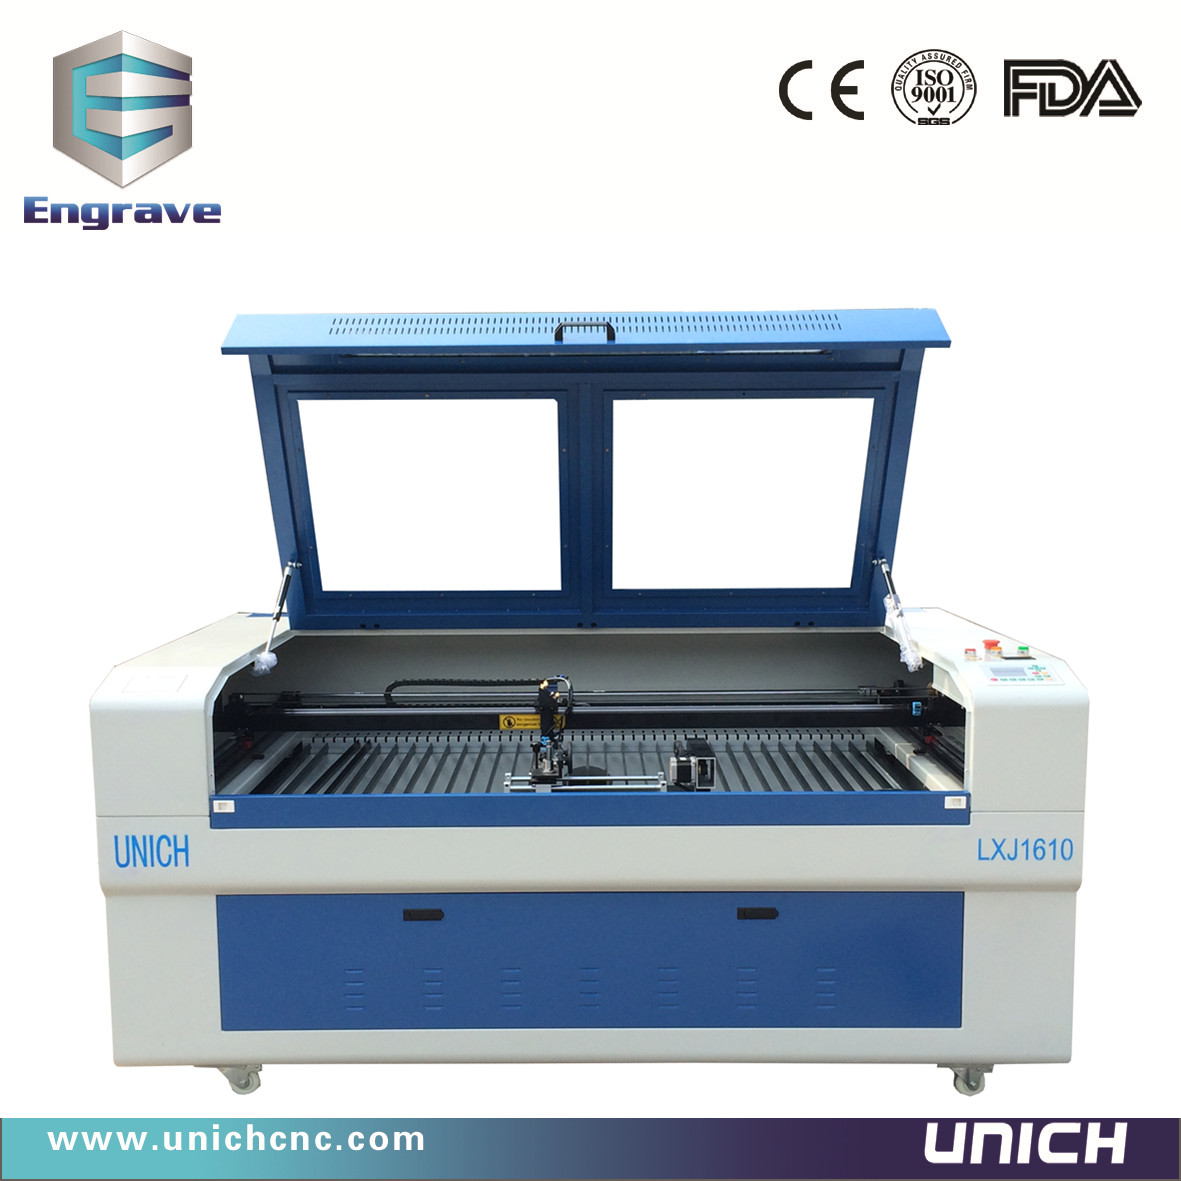 UNICH LXJ1610 CNC Laser (1600x1000mm working area )